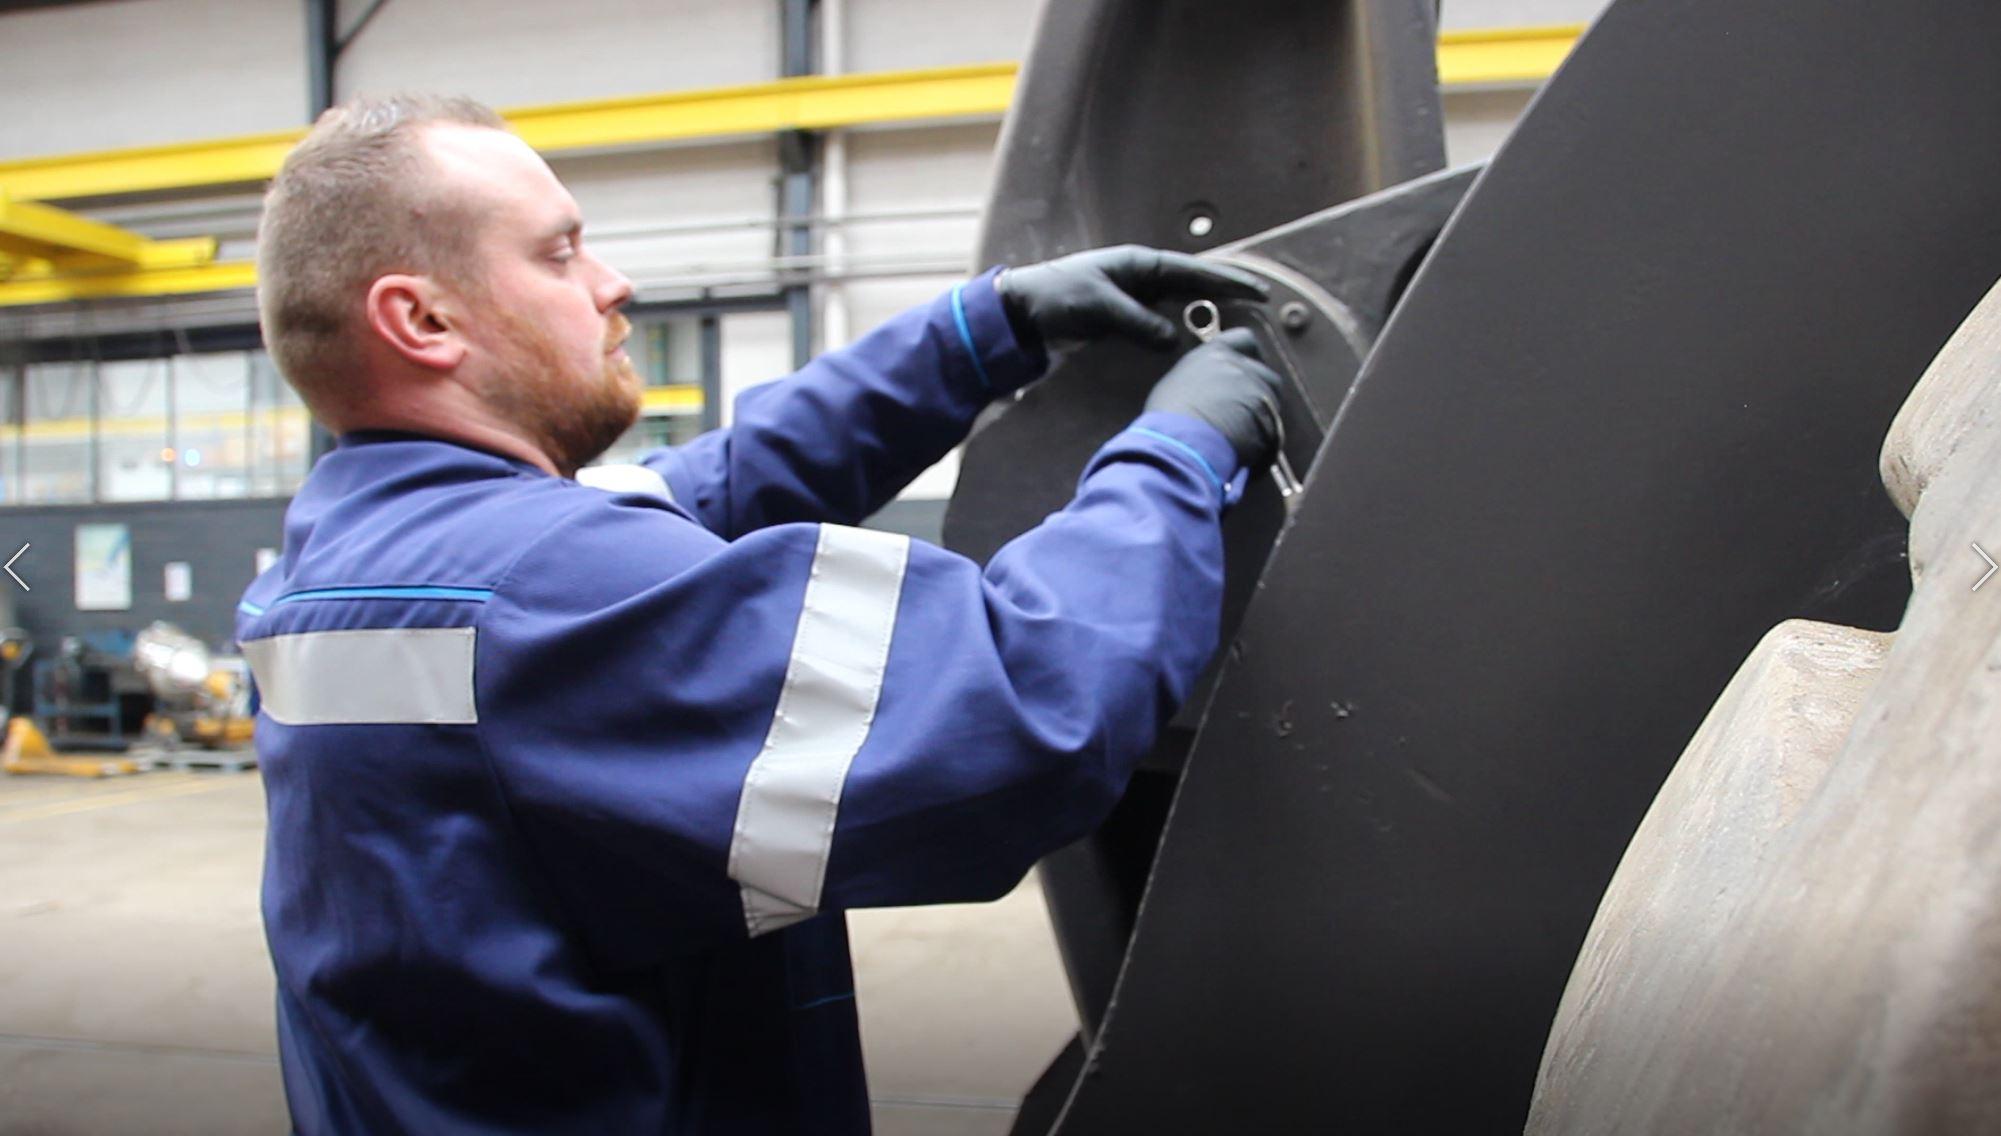 technicien mécanicien réparation SAV